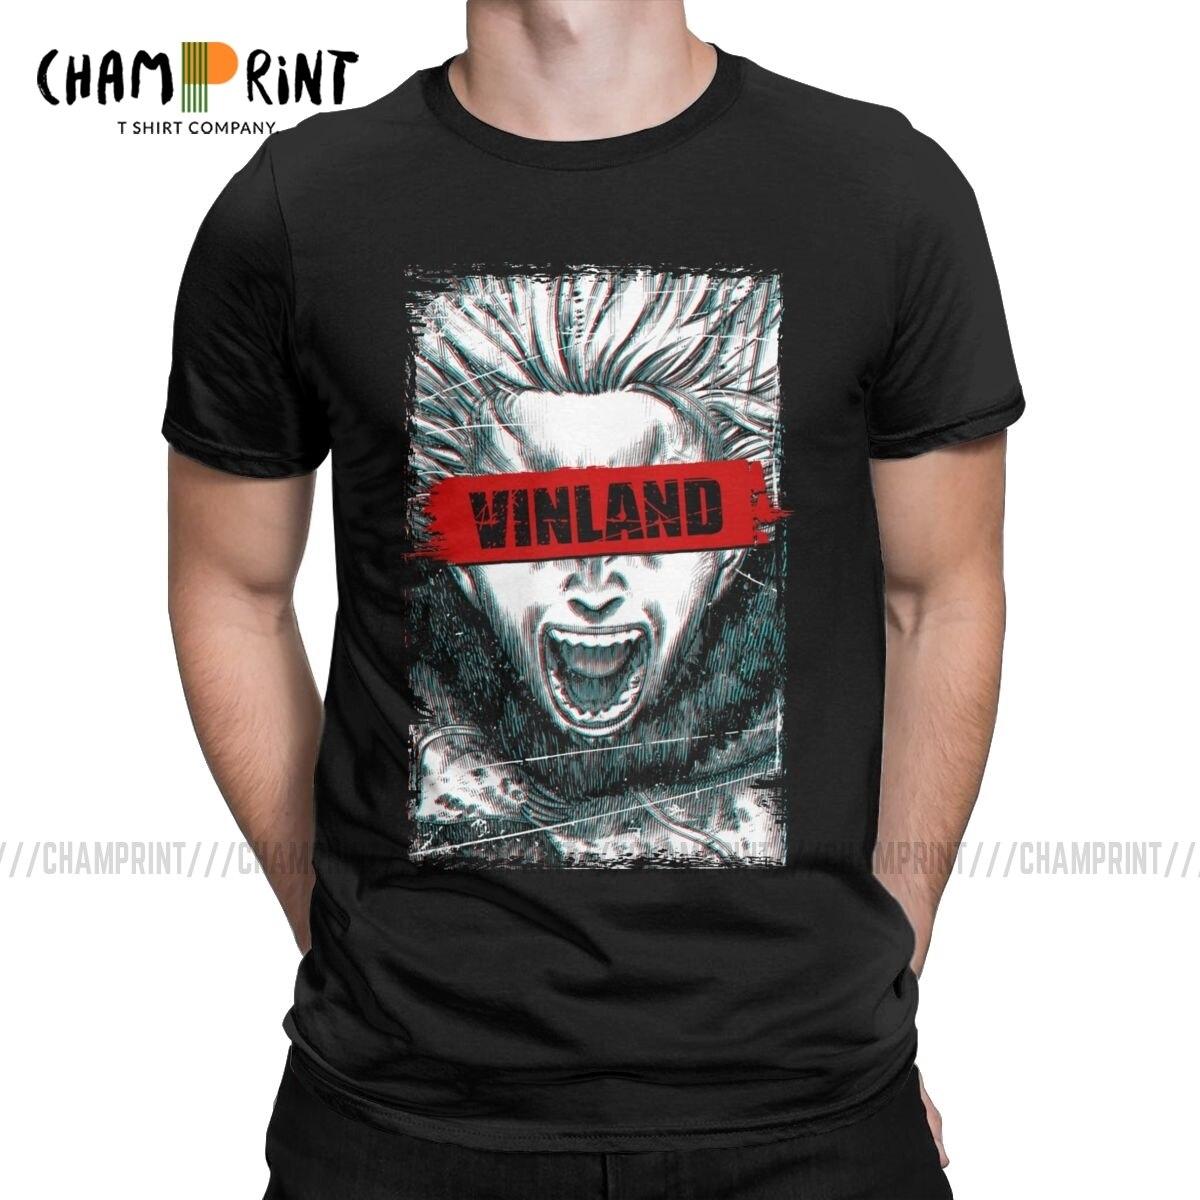 Camisetas vinland saga pinfinn anime, camisetas para homens, viking otaku manga, vintage, de algodão puro, gola redonda, camisetas originais topos